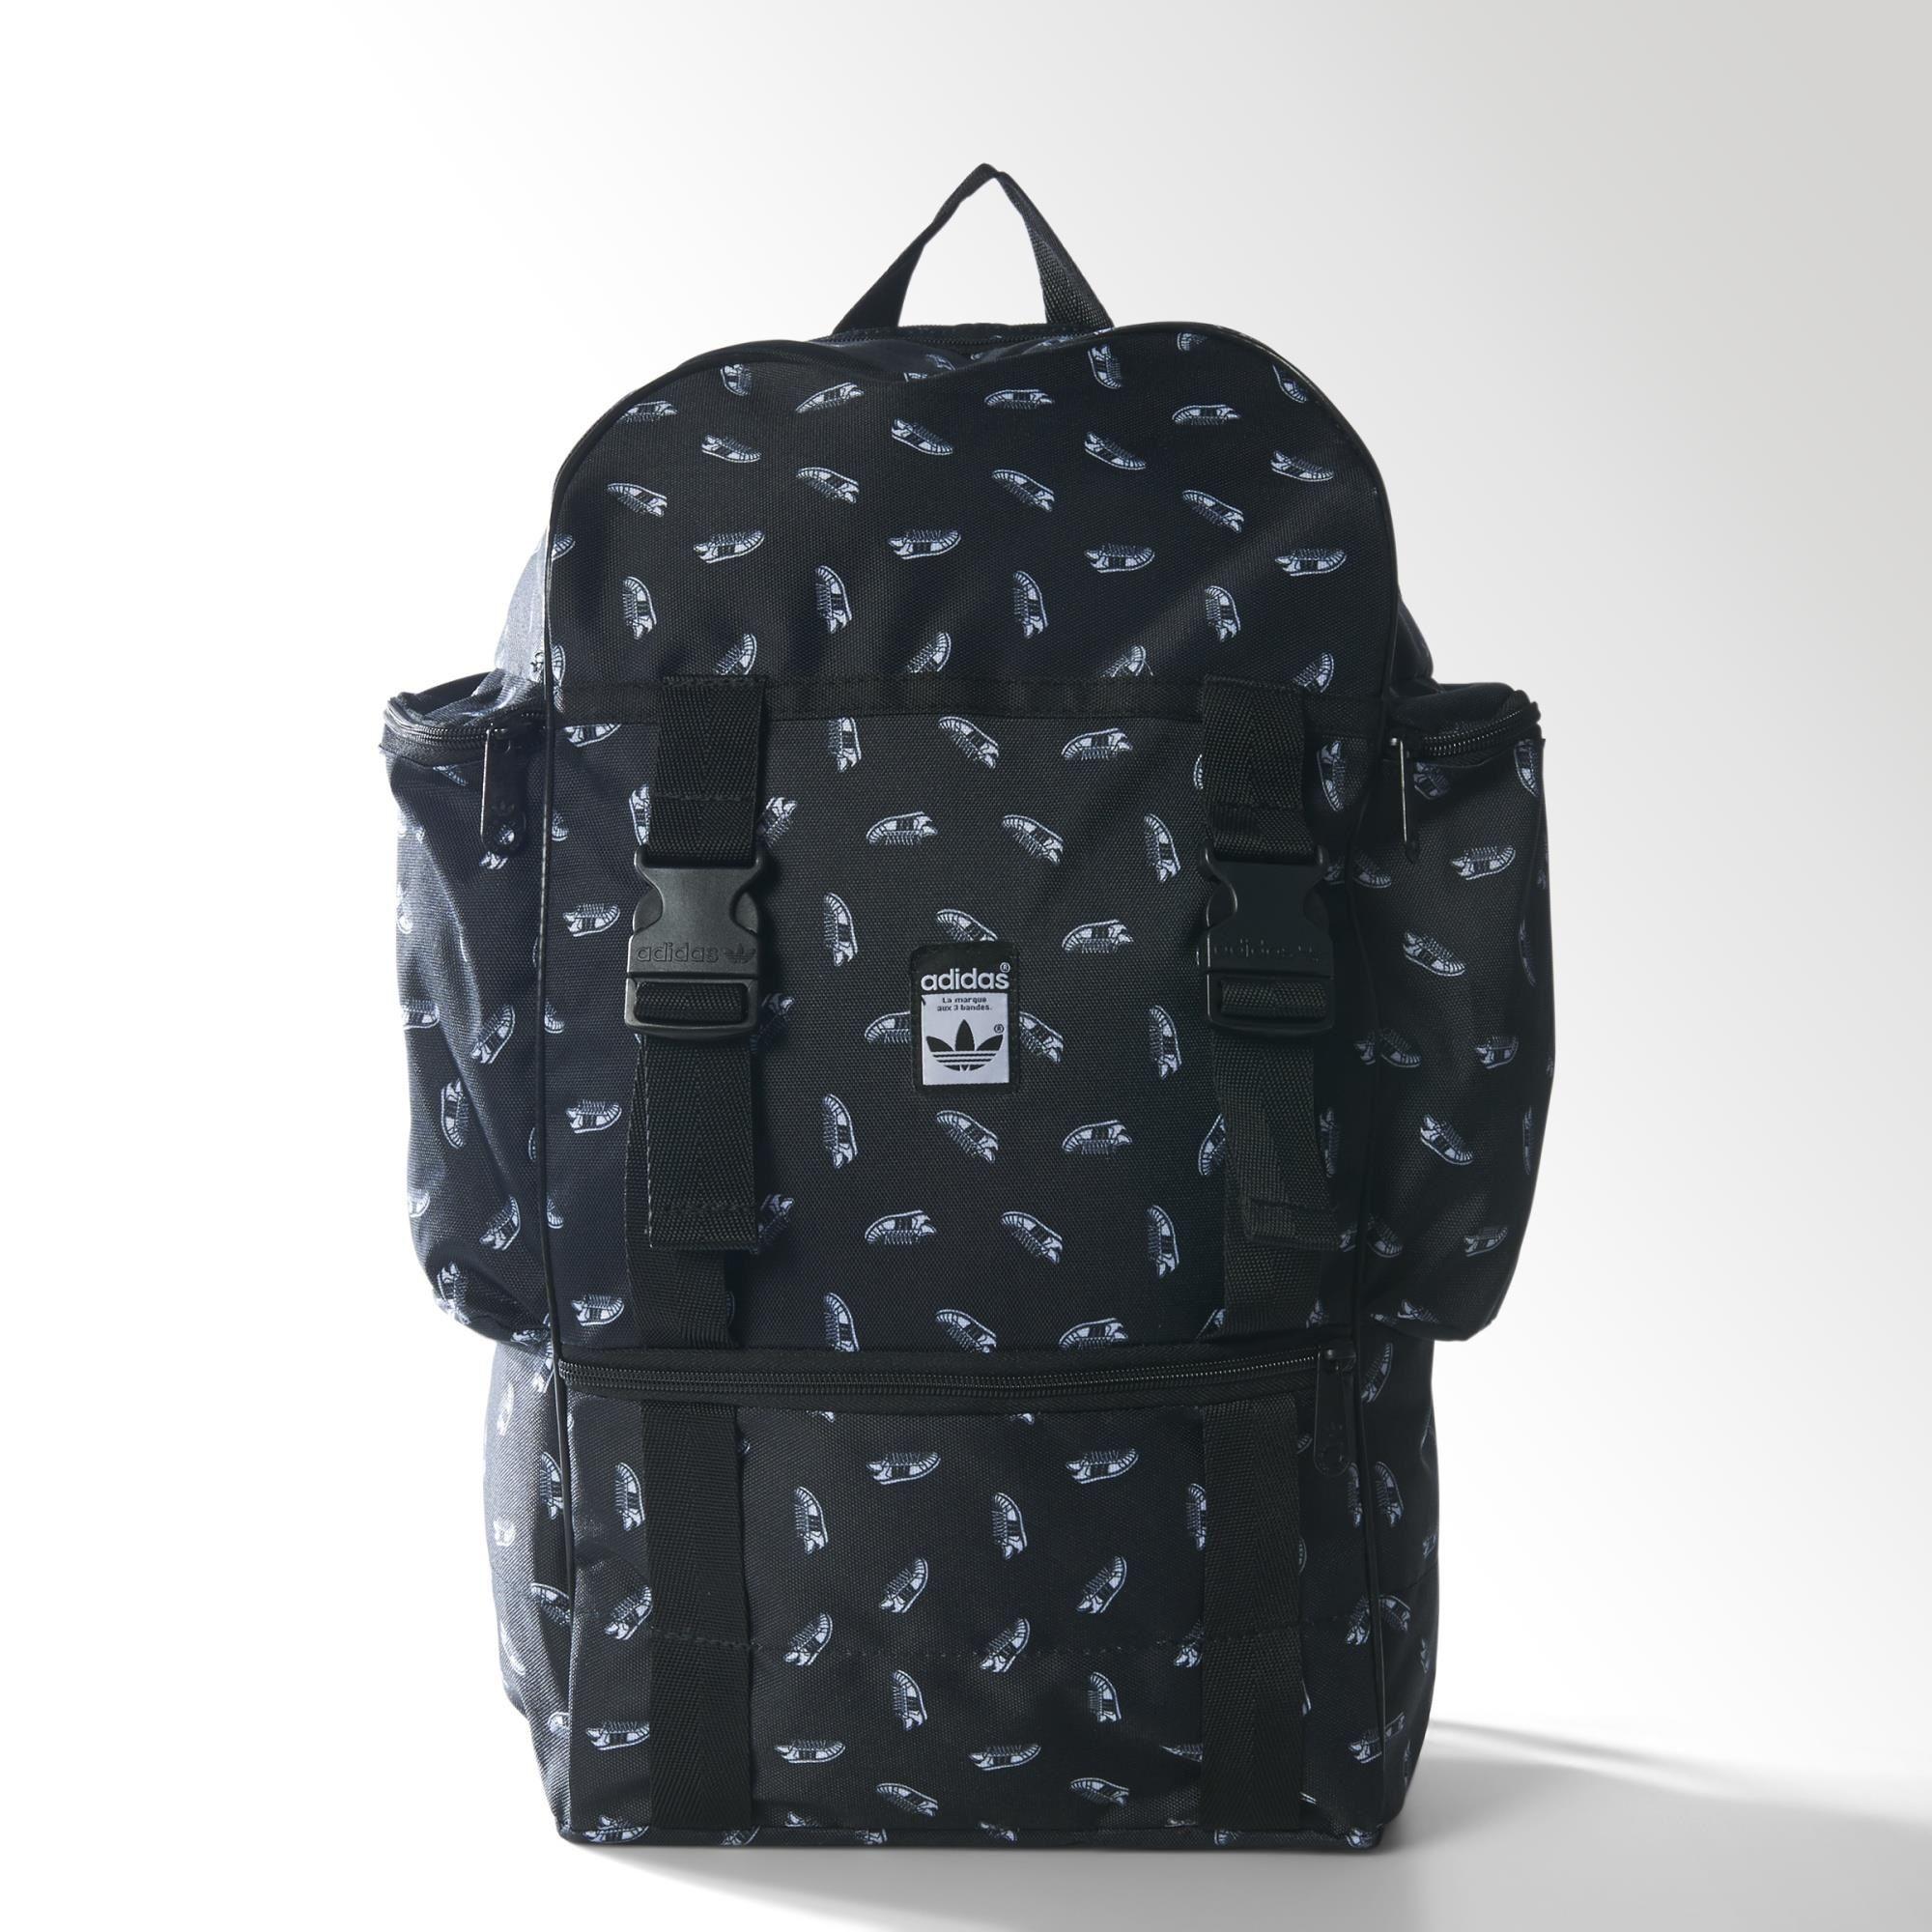 adidas superstar rucksack